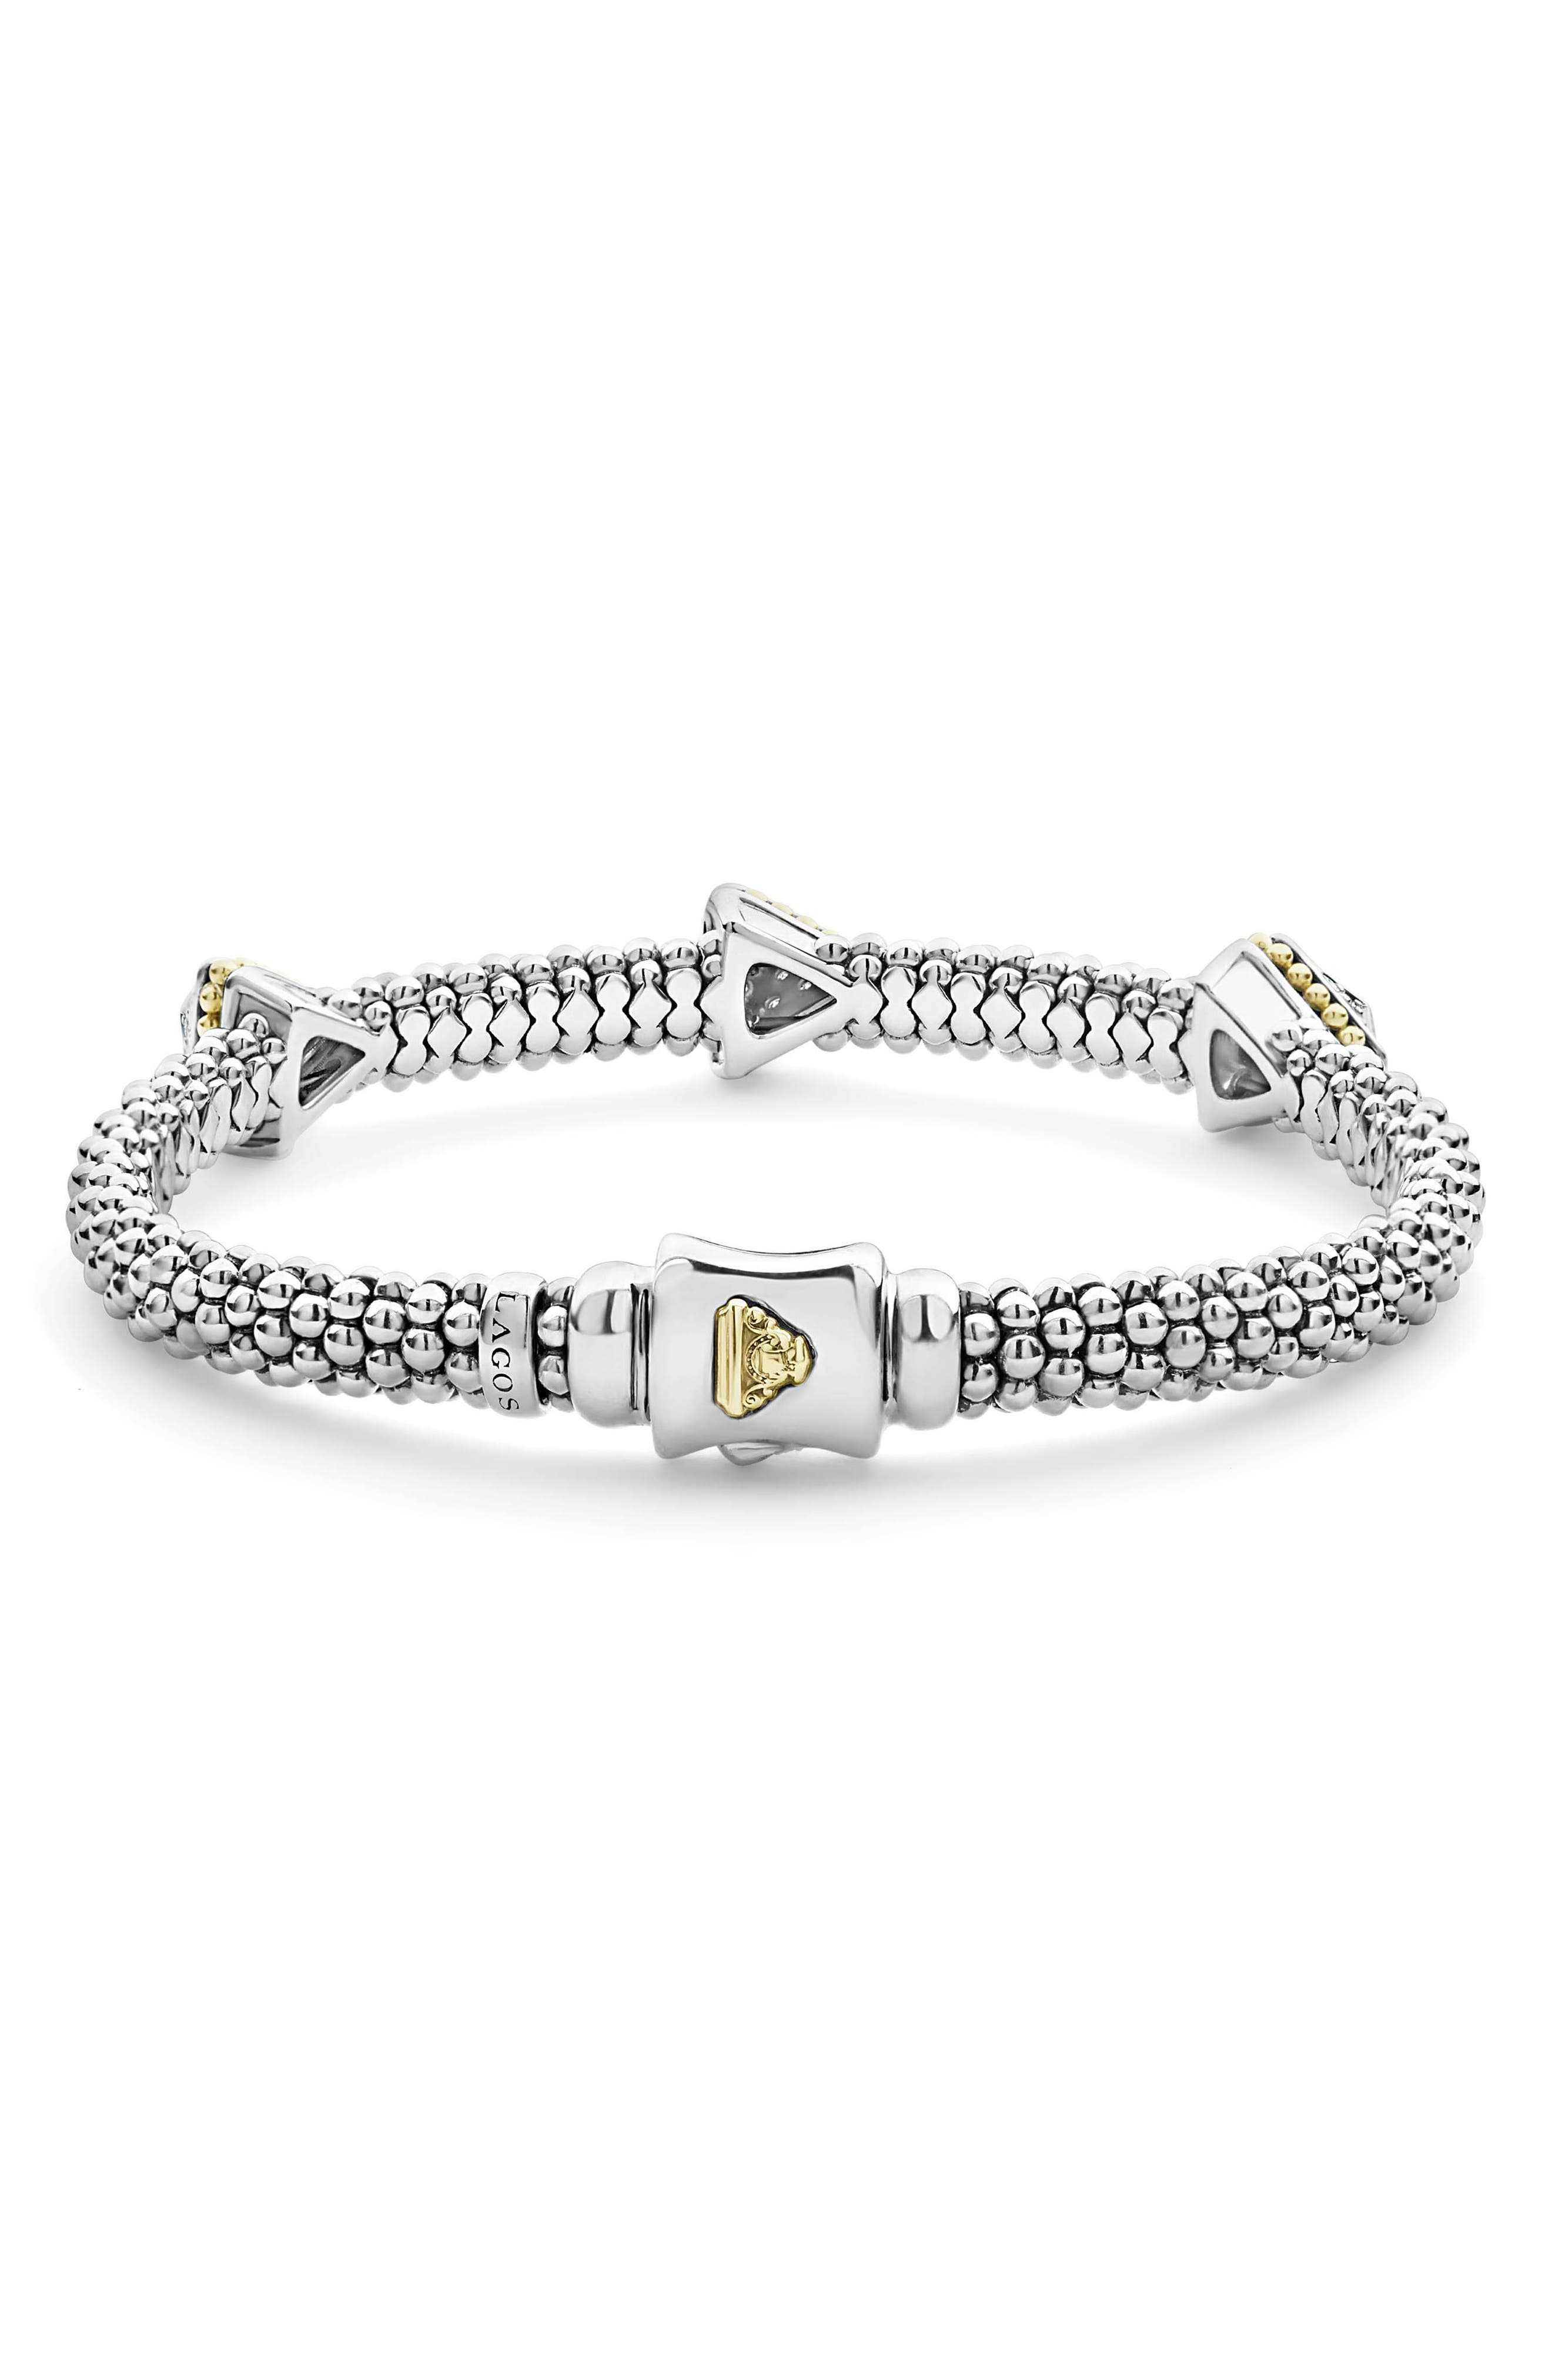 KSL Lux Diamond Pyramid Bracelet,                             Alternate thumbnail 3, color,                             SILVER/ DIAMOND